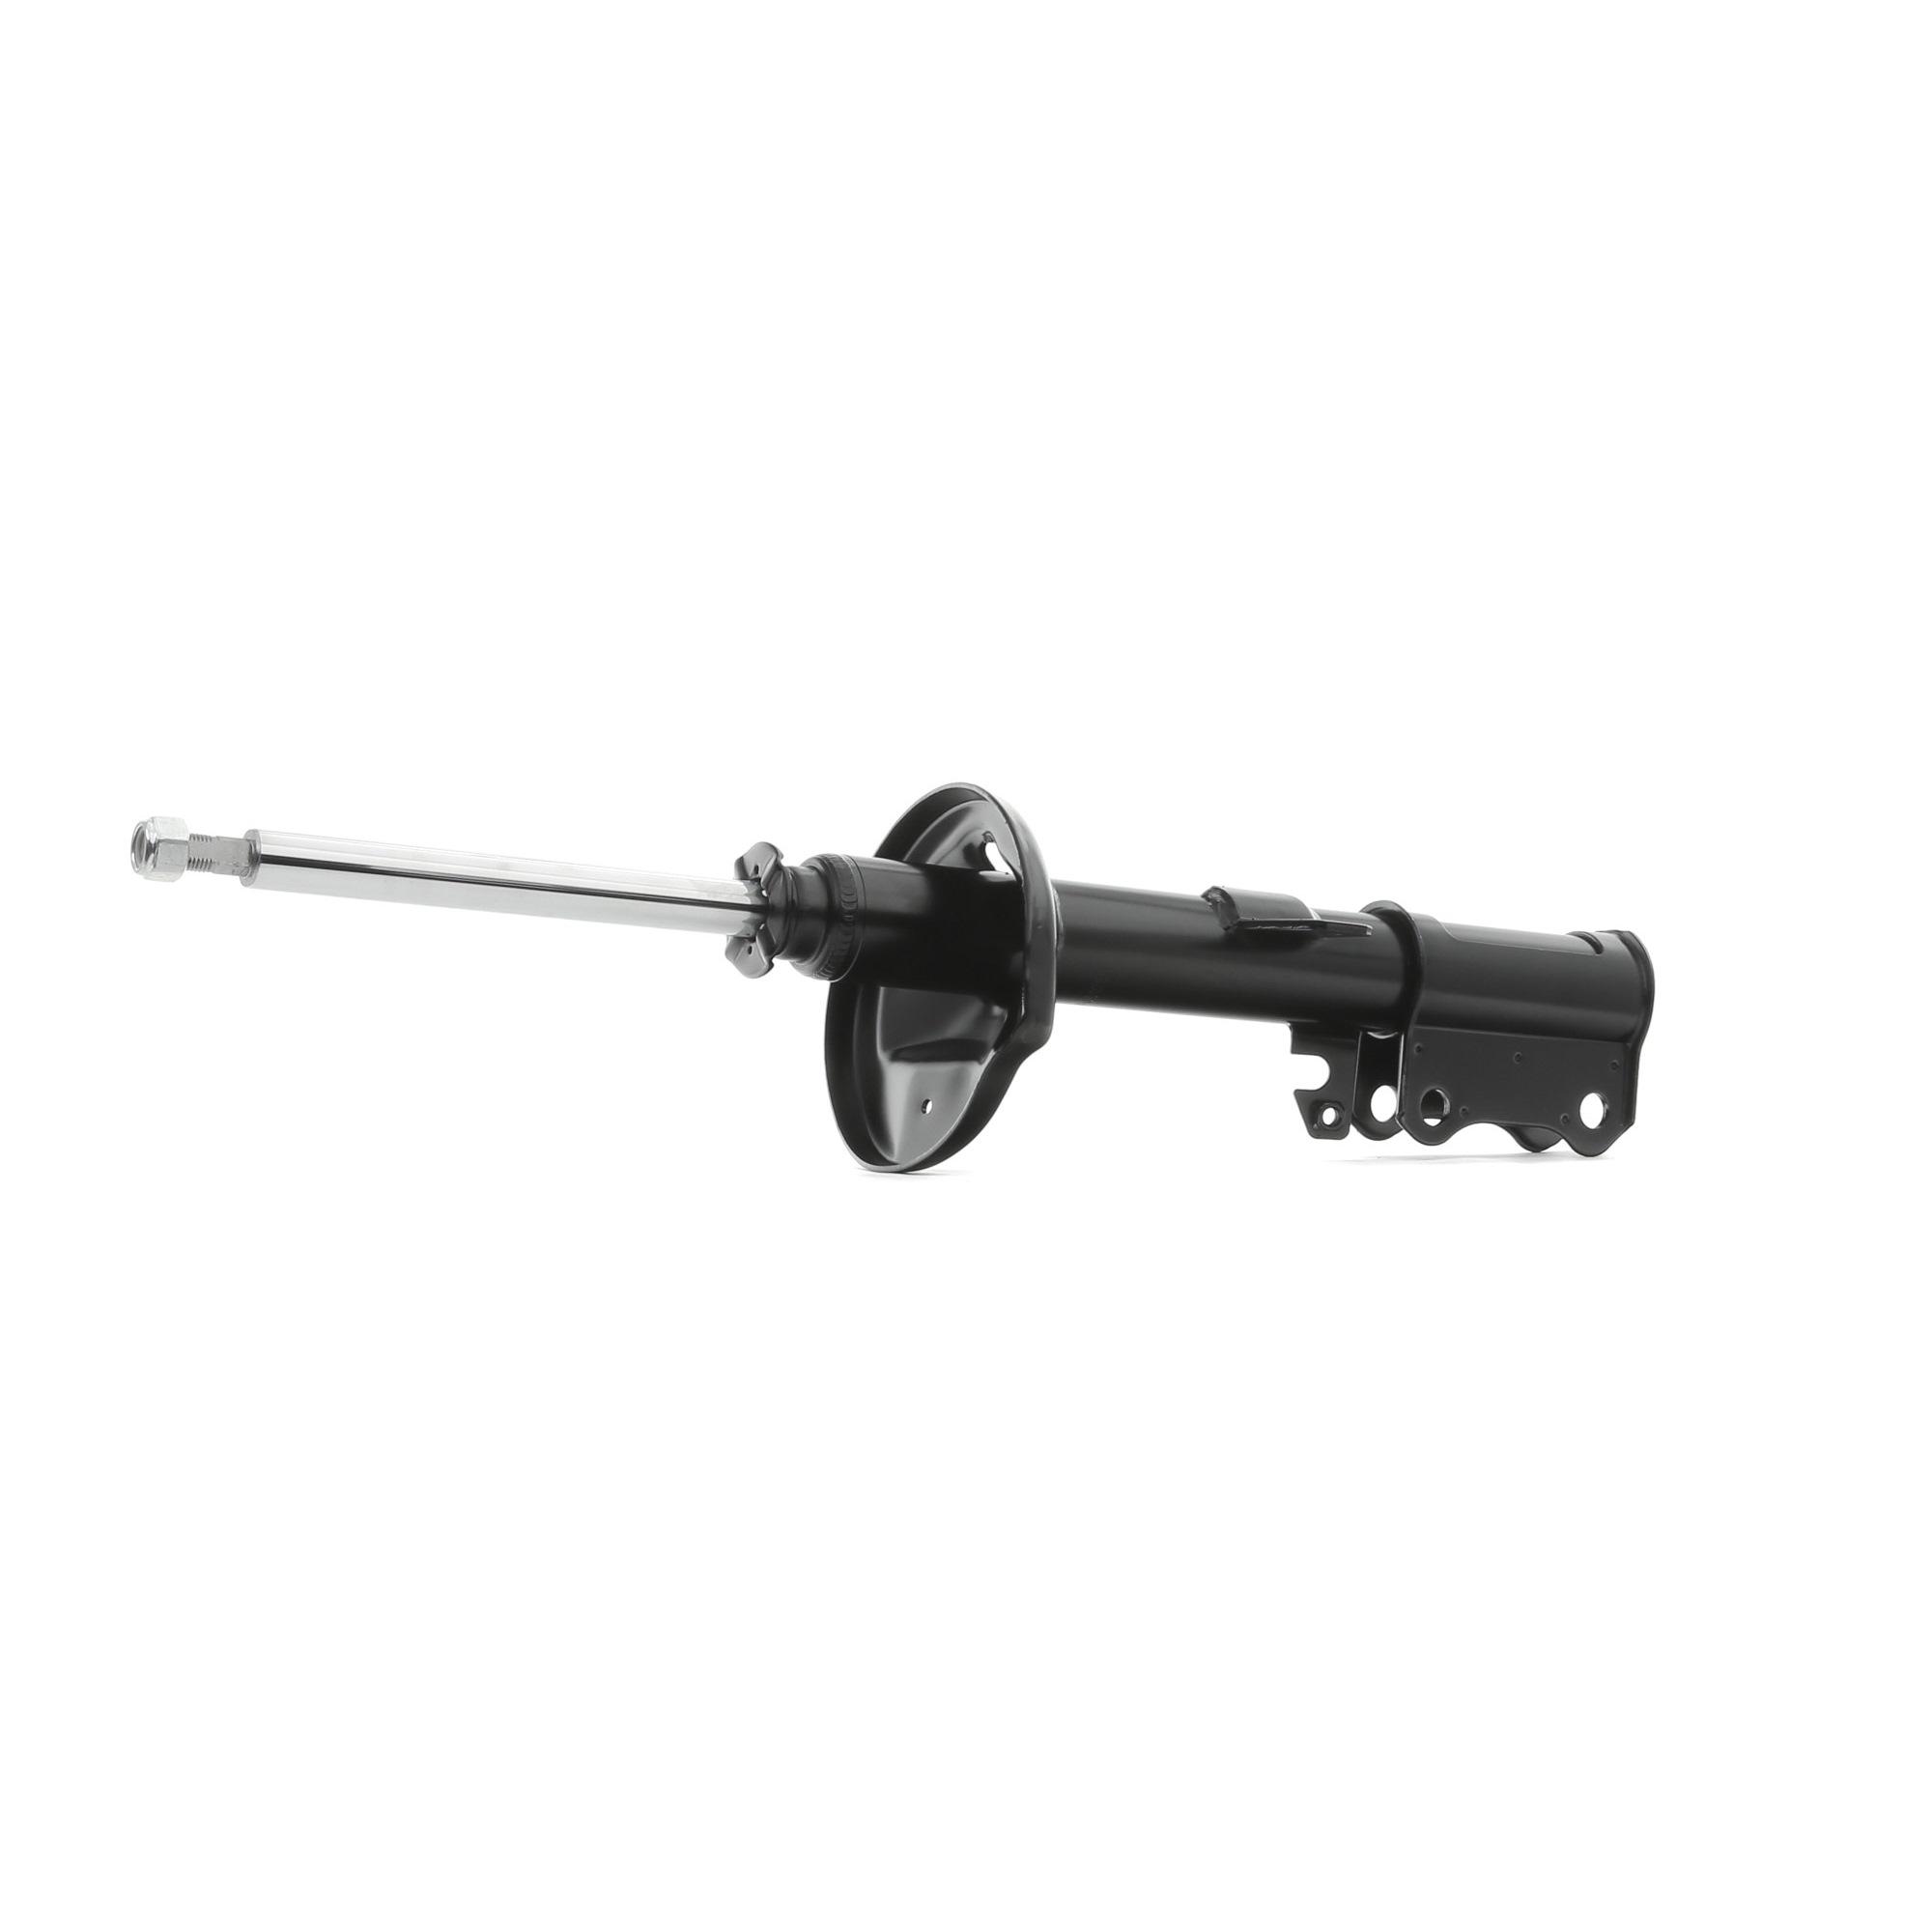 Stoßdämpfer RIDEX 854S1162